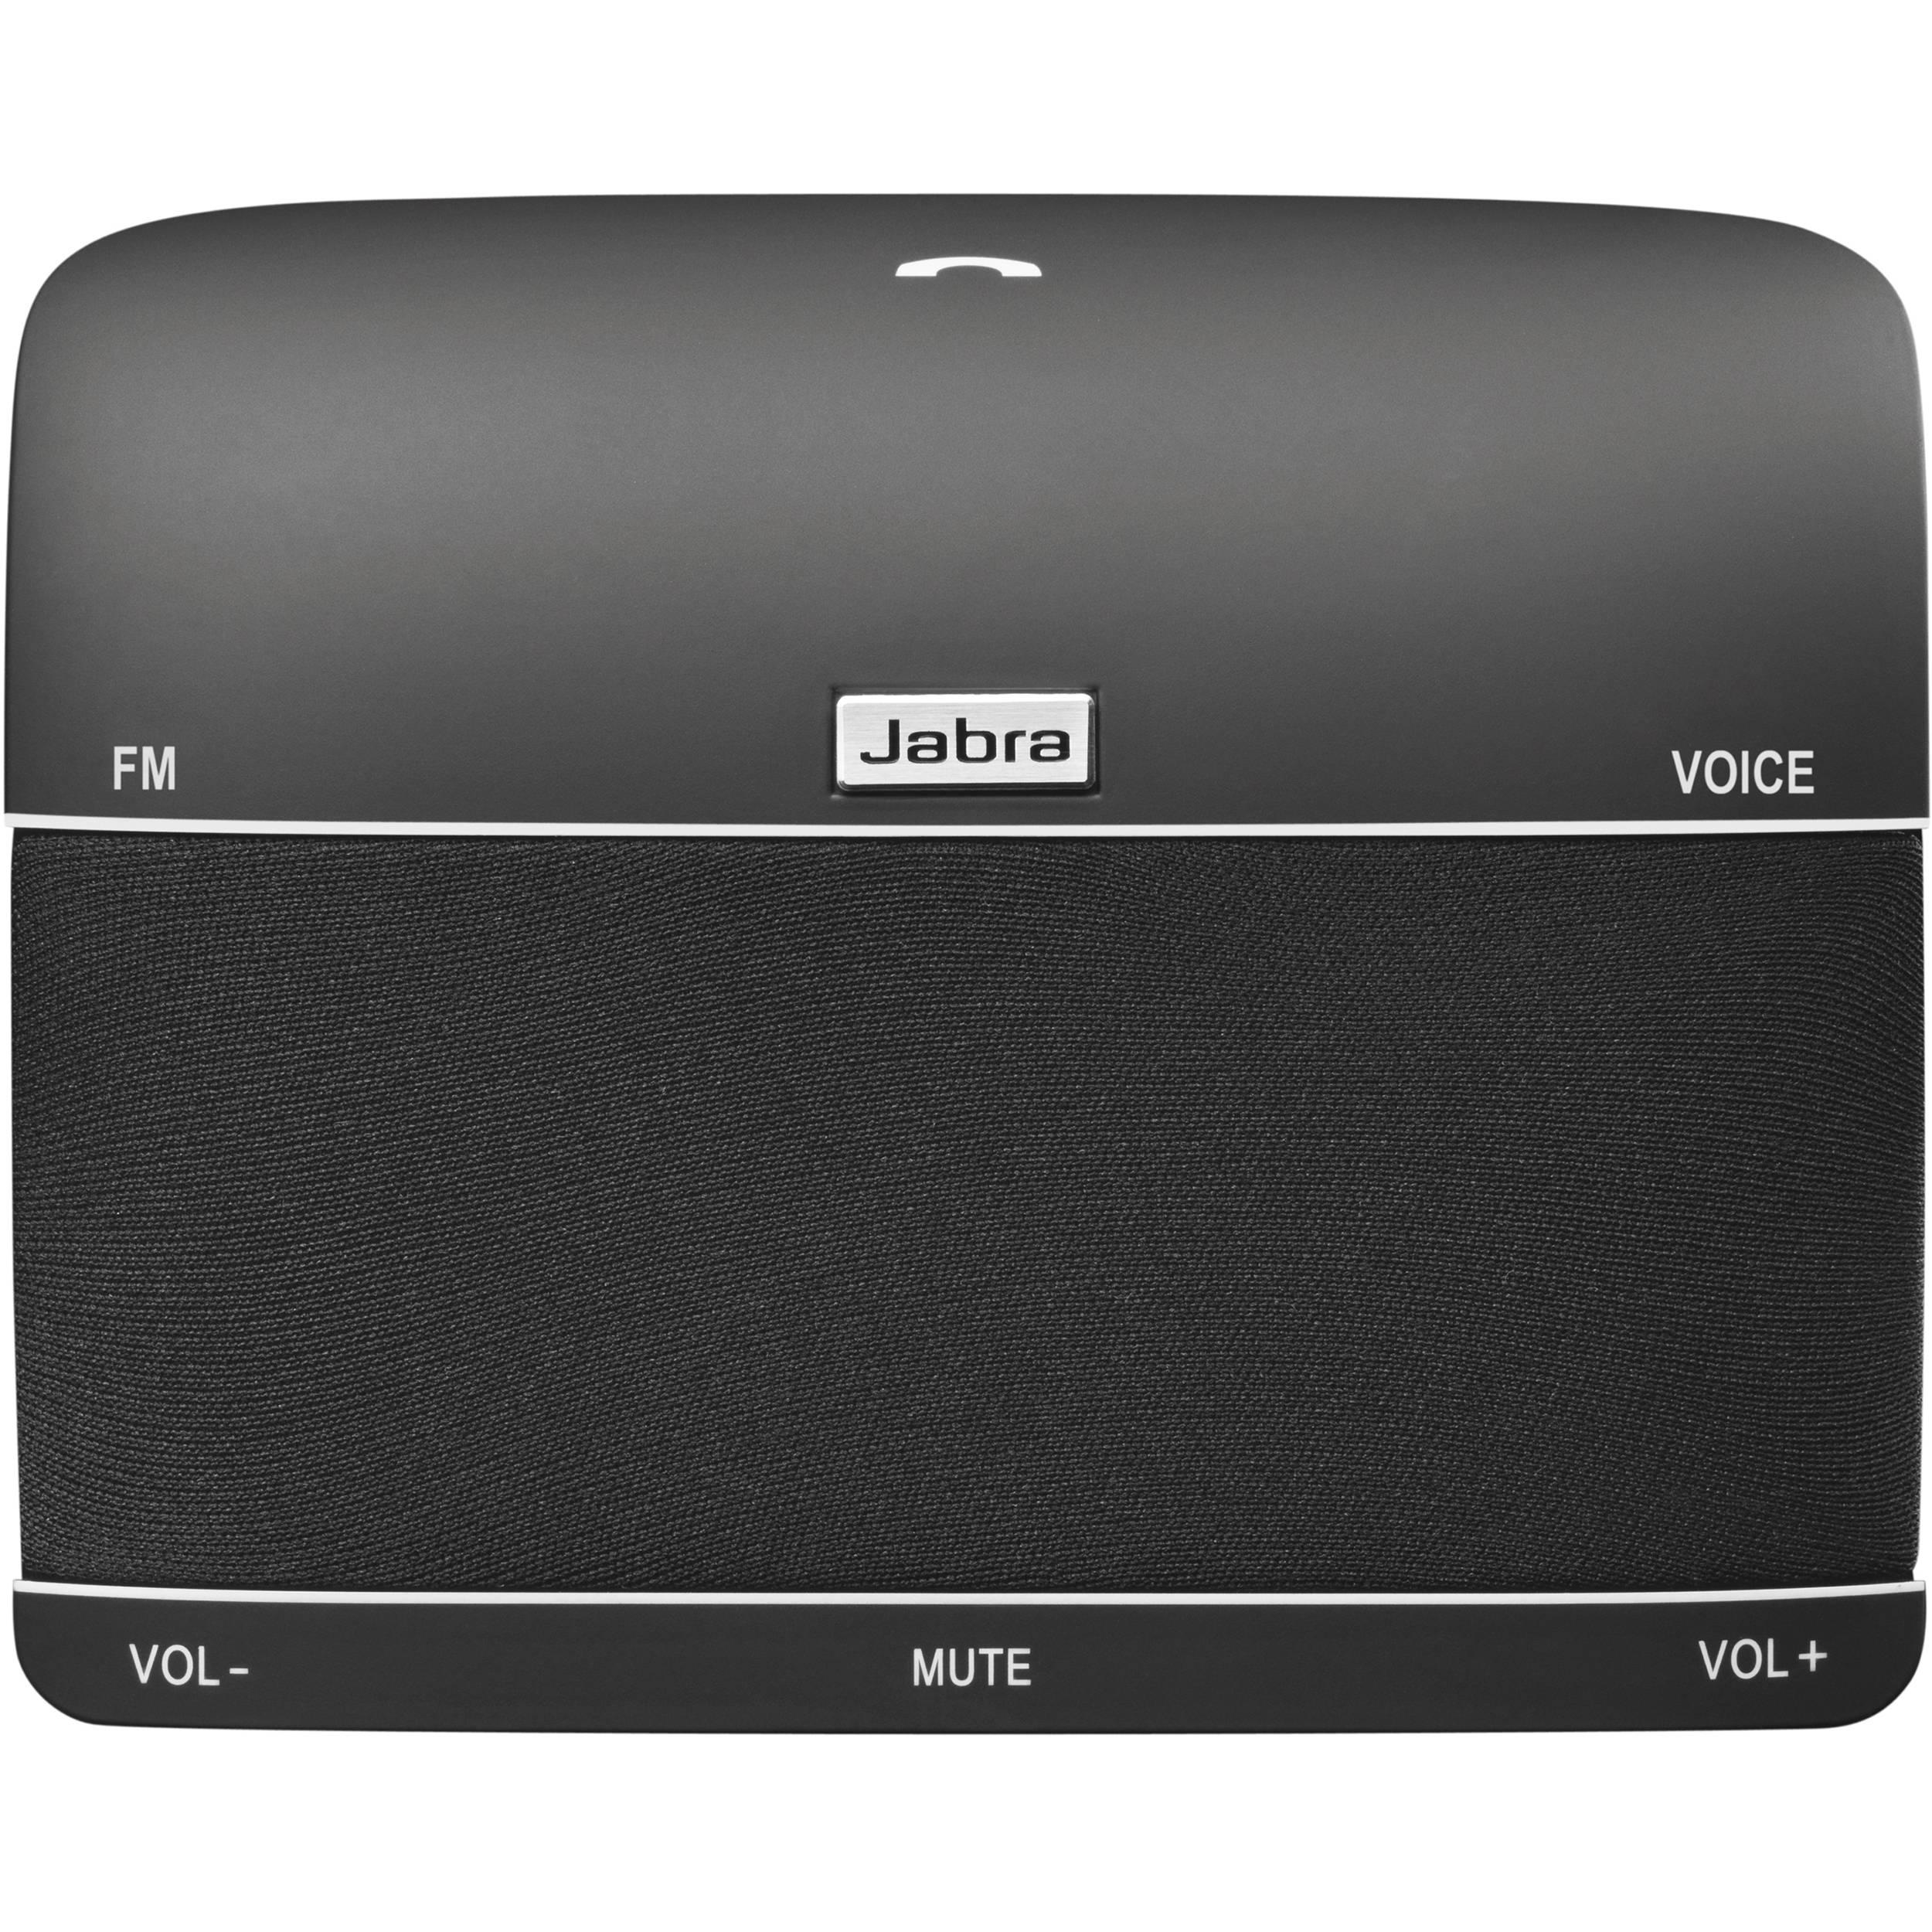 Jabra Freeway Bluetooth Speakerphone 100-46000000-02 B&H Photo